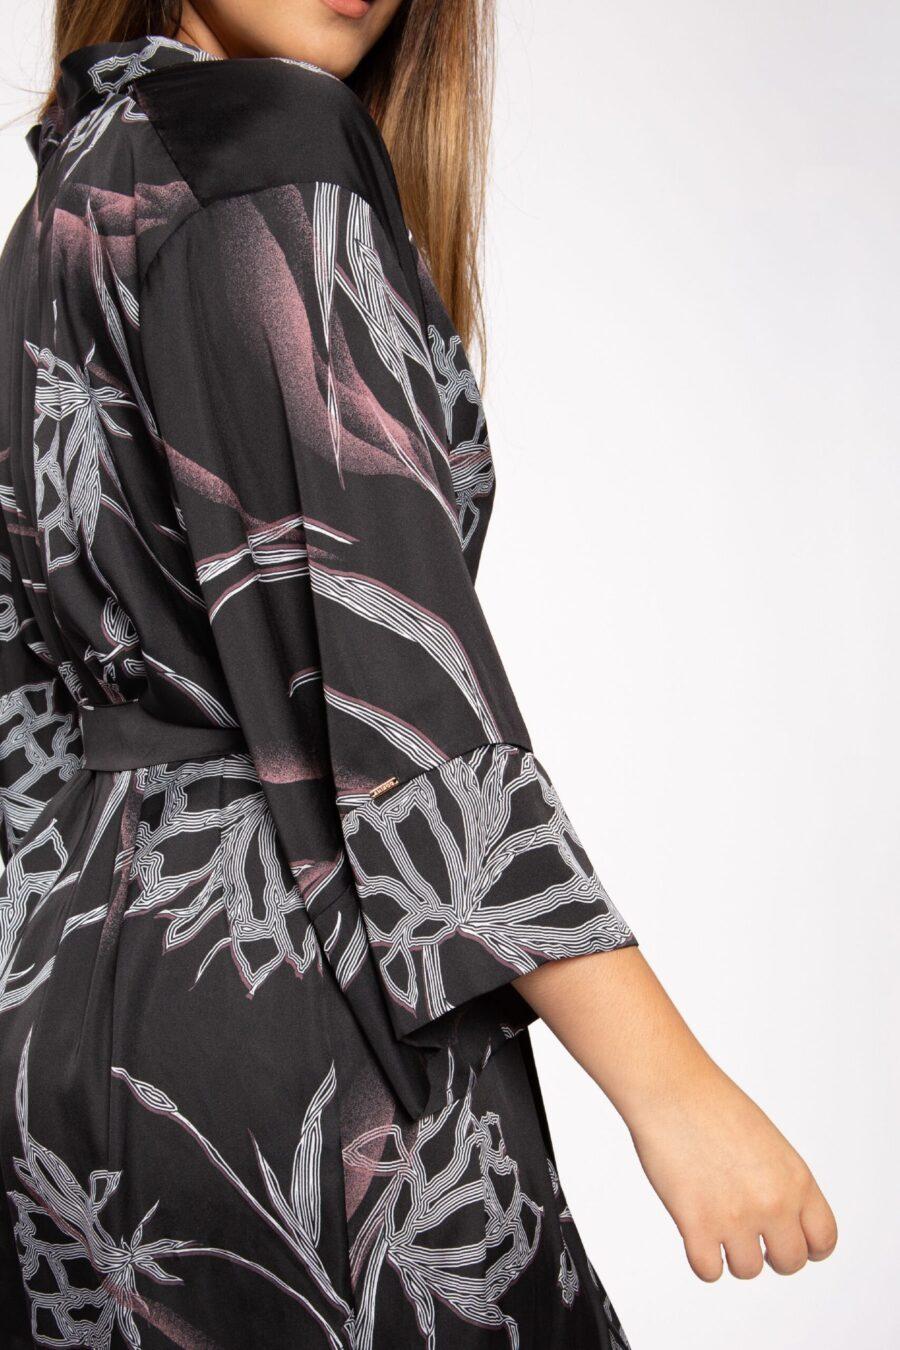 DORINA Dolce Eco Robe Cover Up